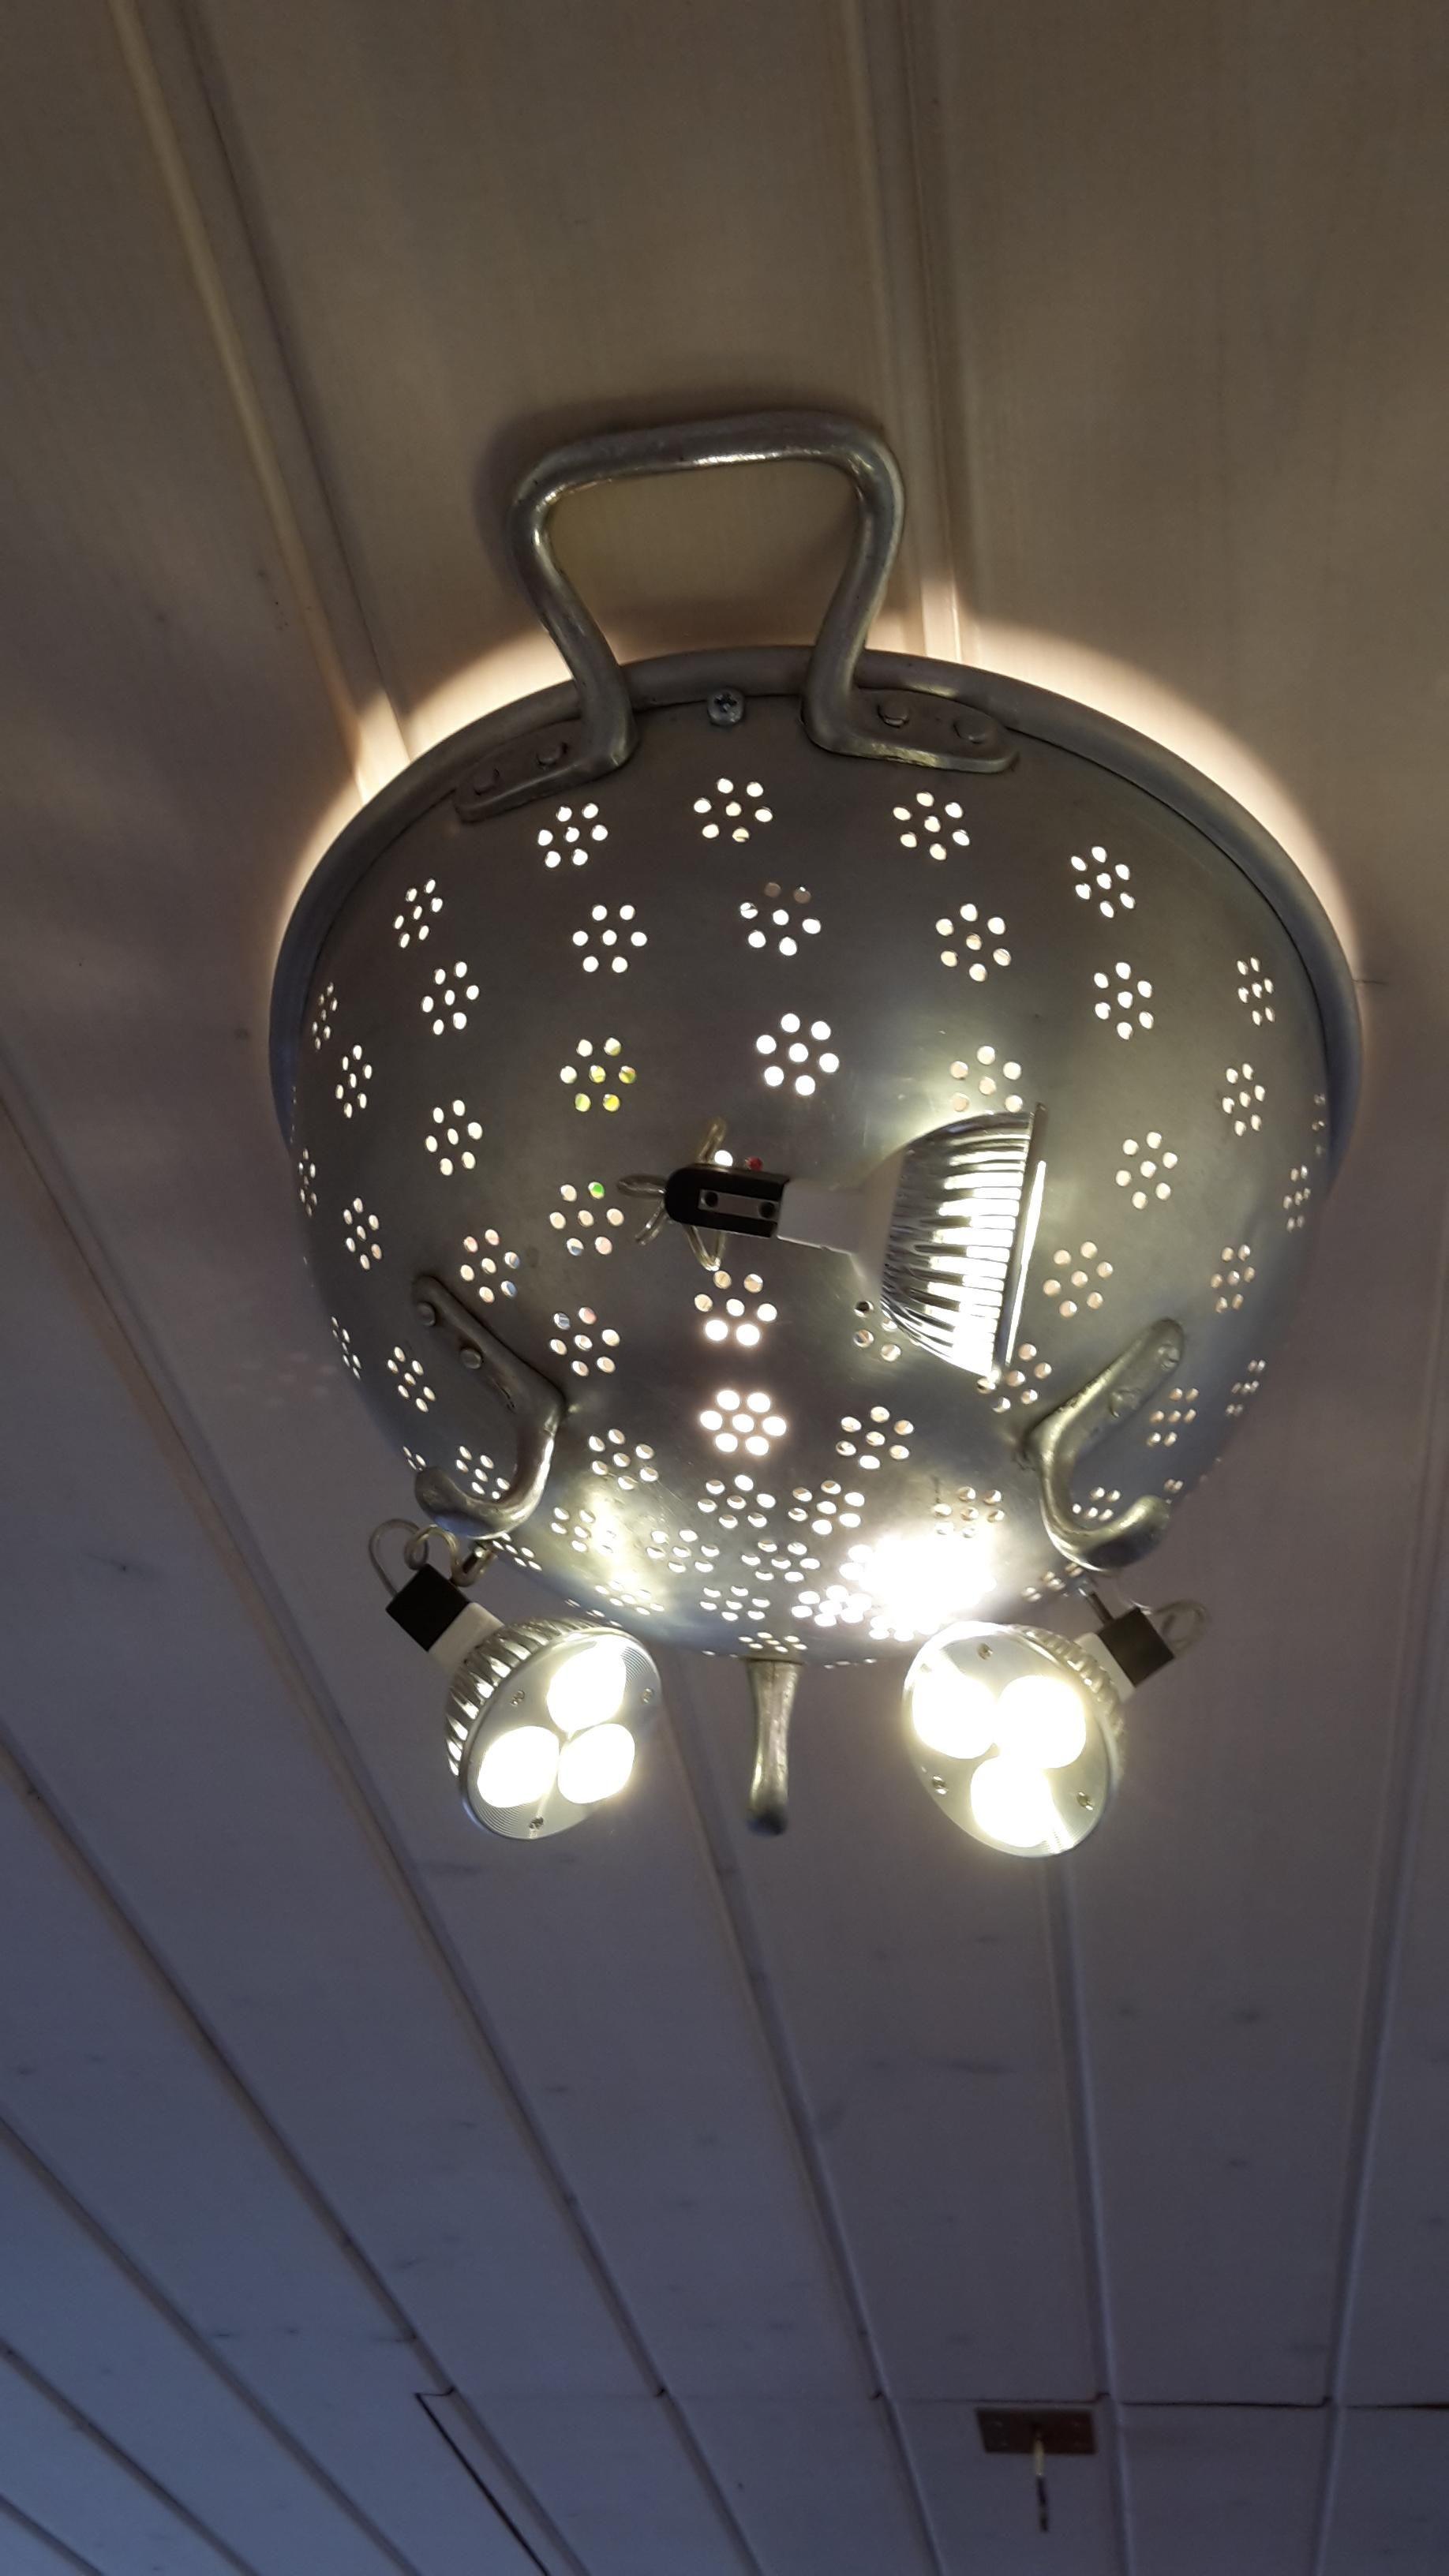 Selber gebaute Deckenbeleuchtung aus wiederverwendeten Lcherbecken Recycling LED Lampe selbst